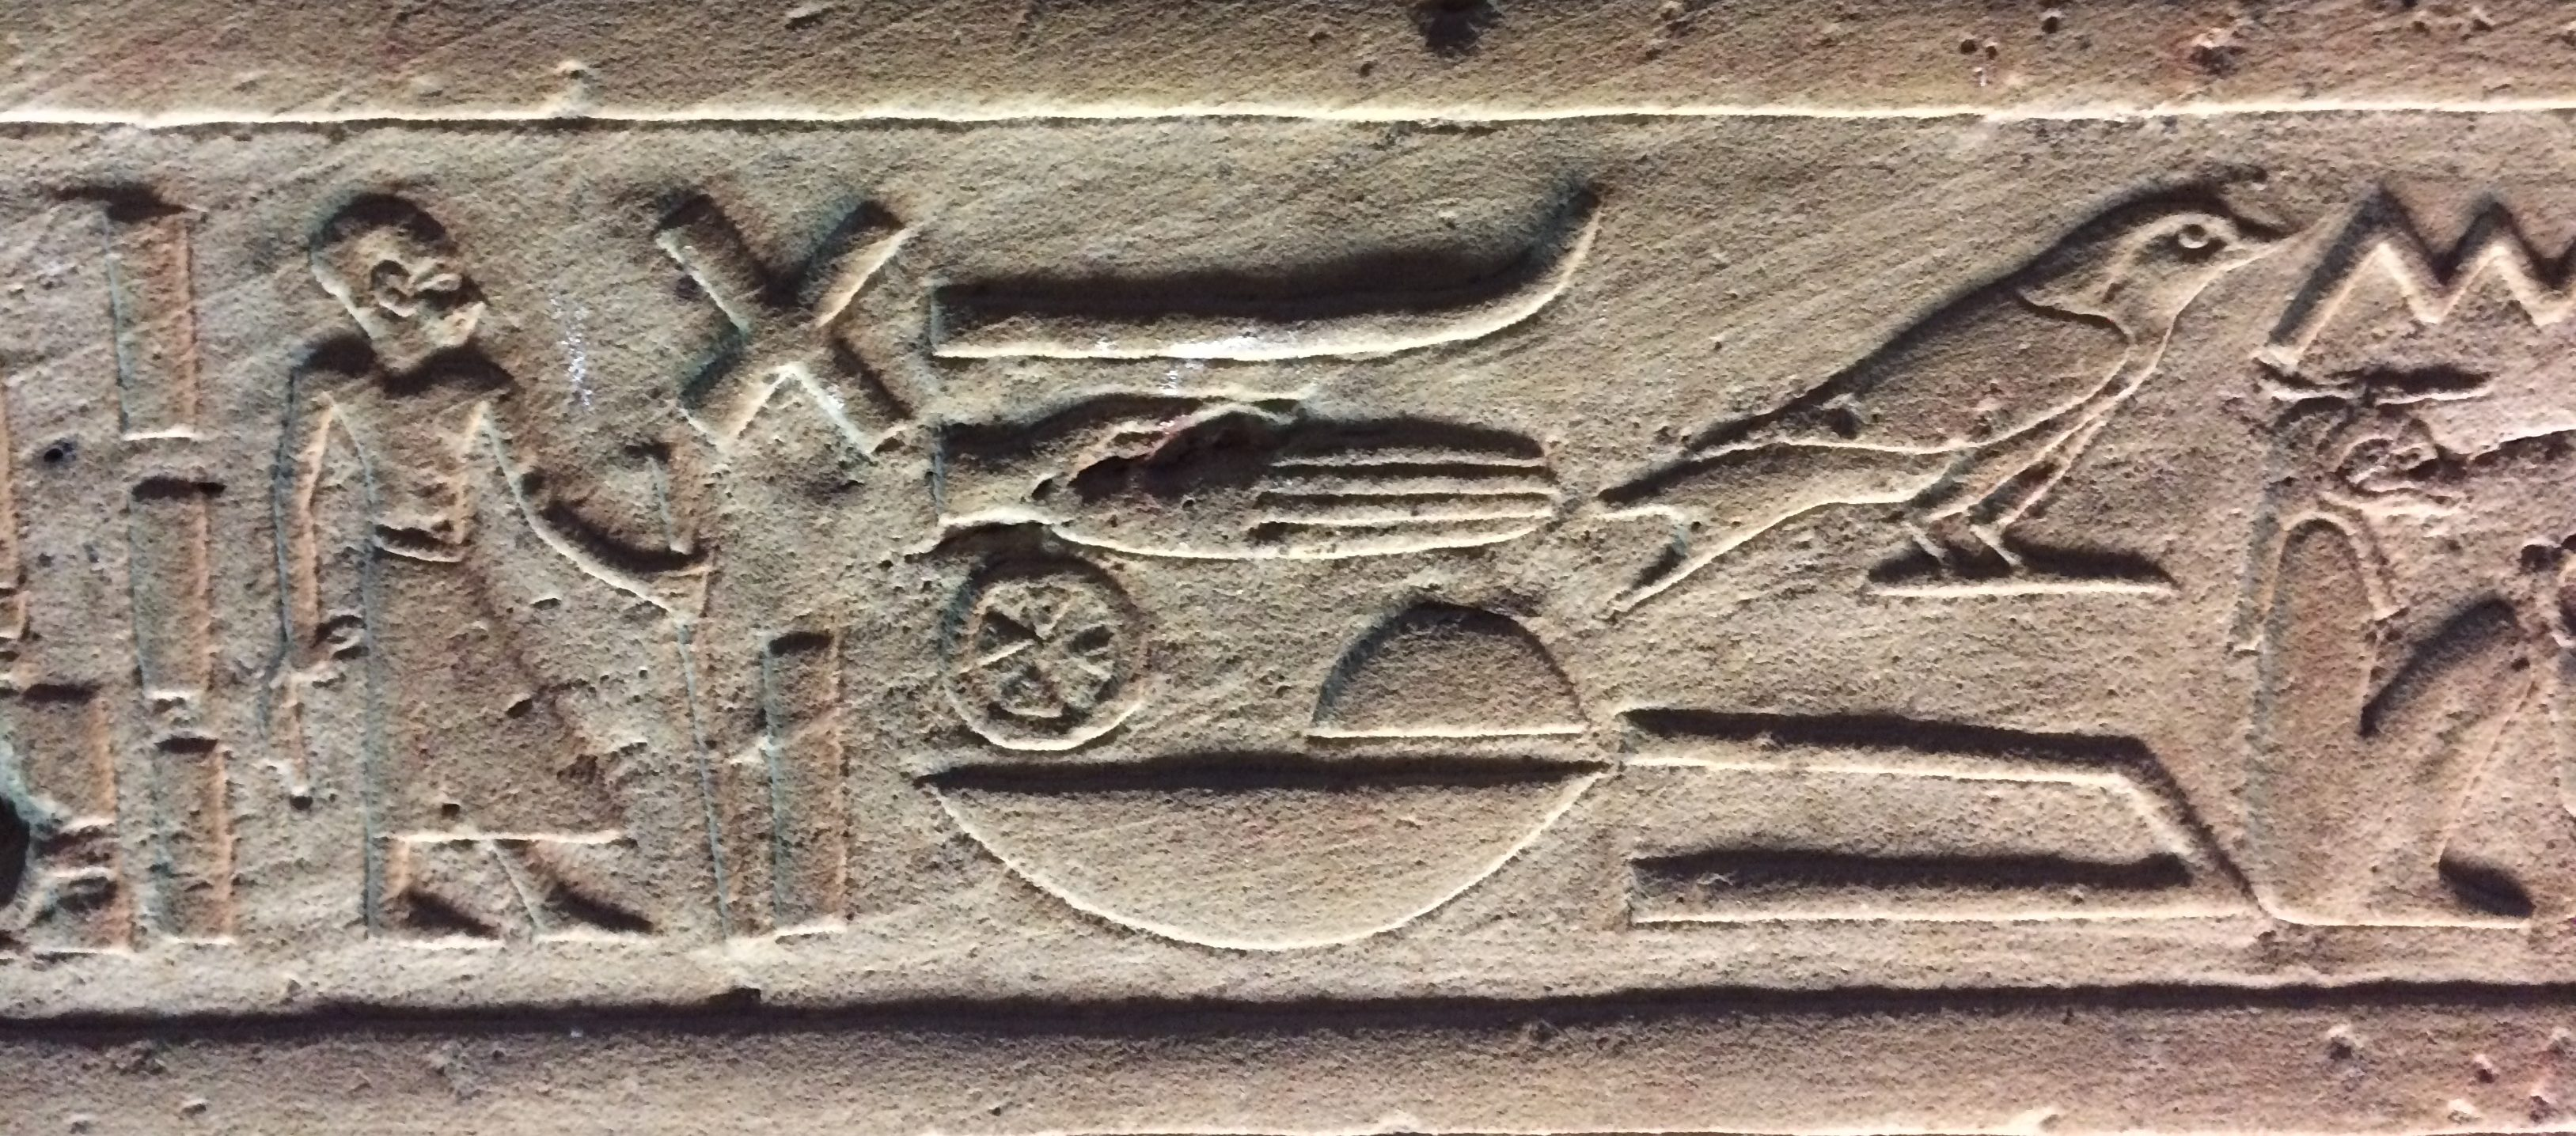 A photo of hieroglyphics including a bird glyph